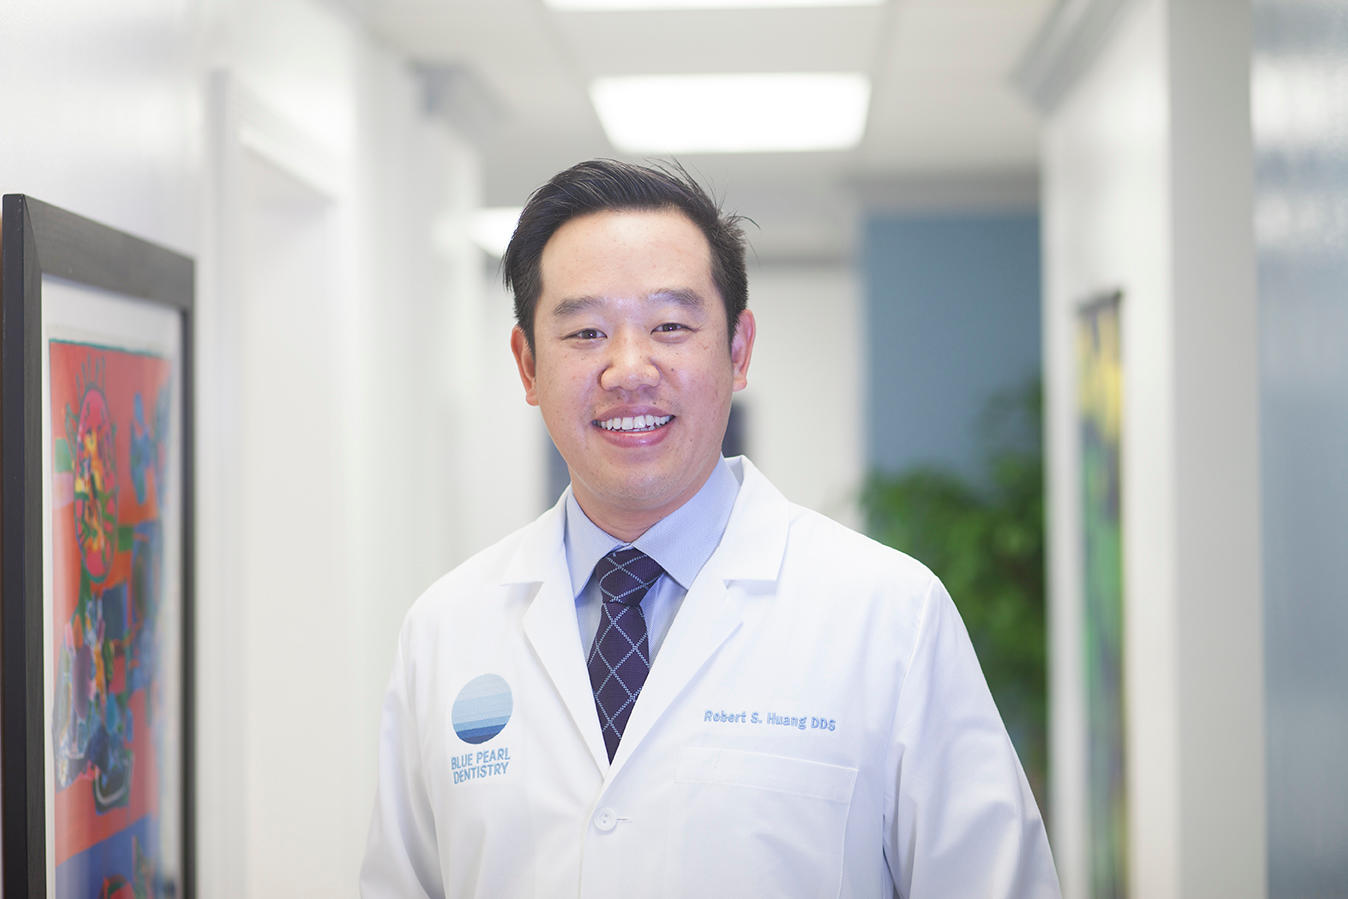 Blue Pearl Dentistry: Robert S. Huang, DDS image 3